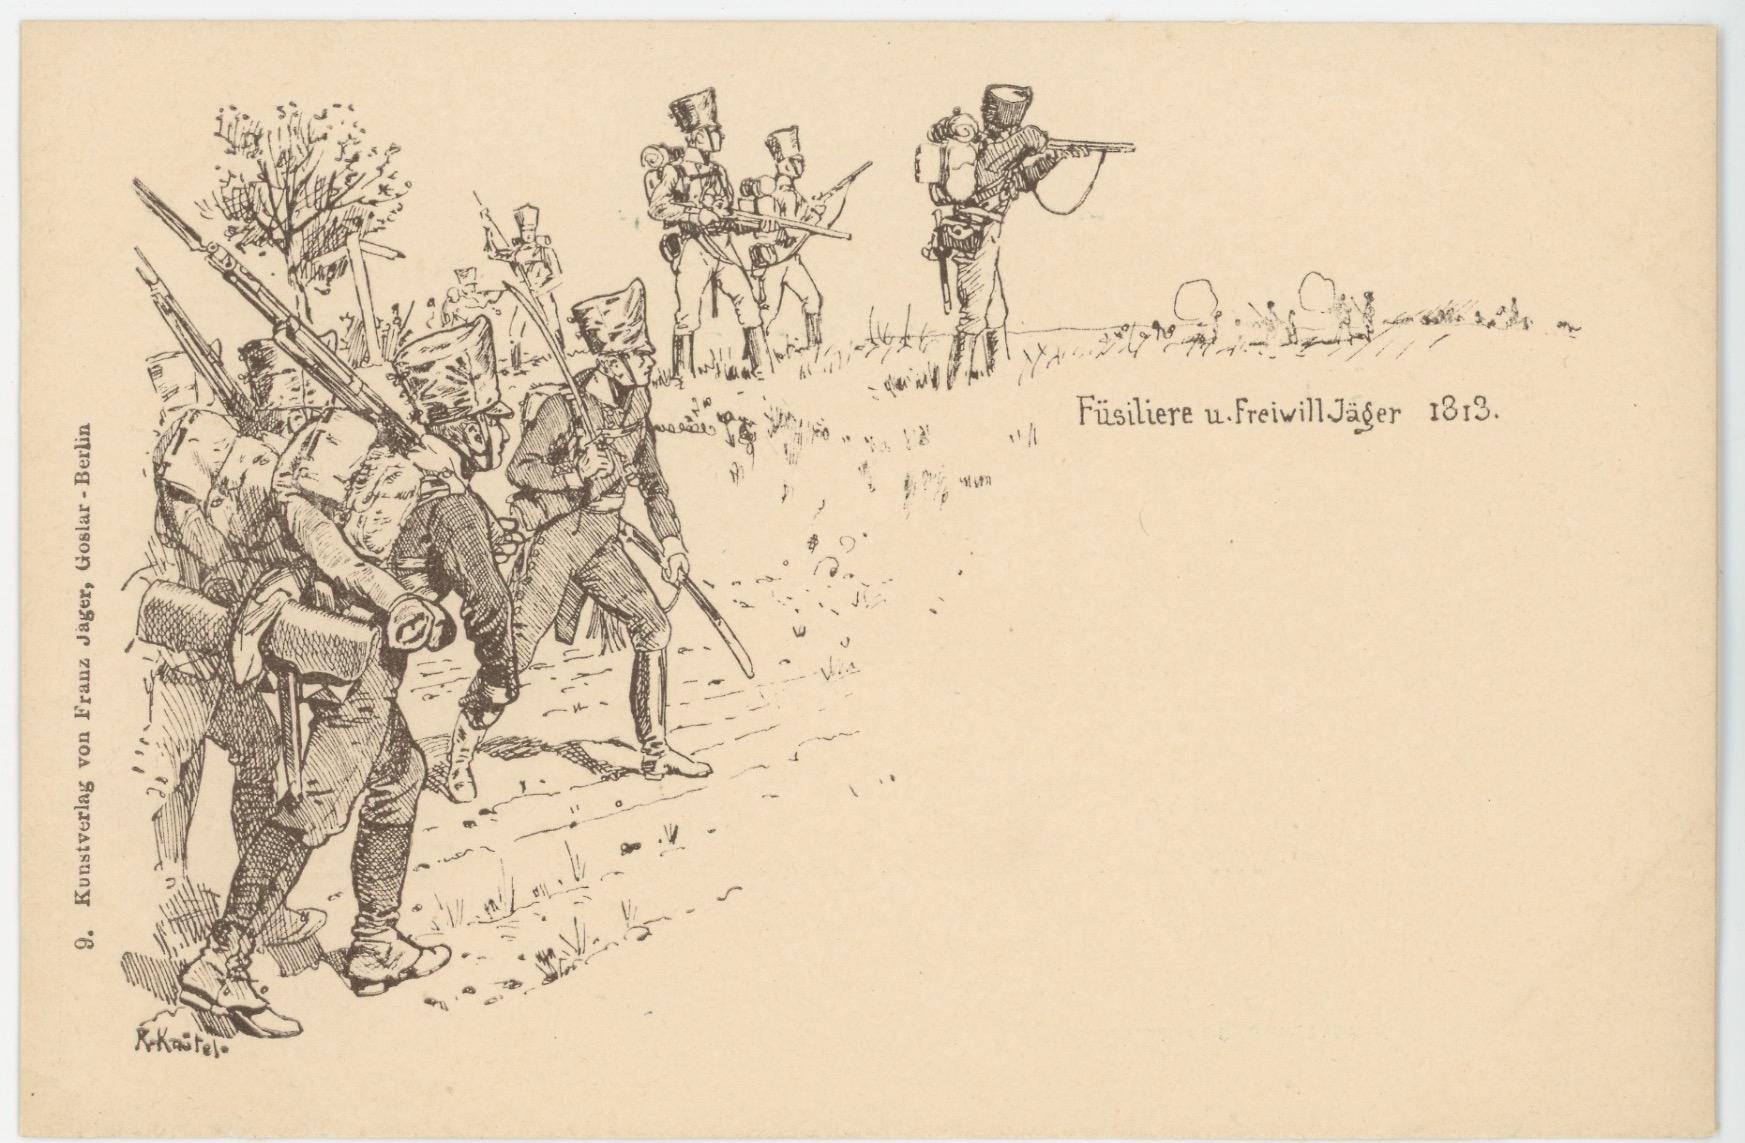 10 Cartes Postales Illustrées - Richard Knötel - Armée Prussienne - Prussian Army - 1709 - 1813